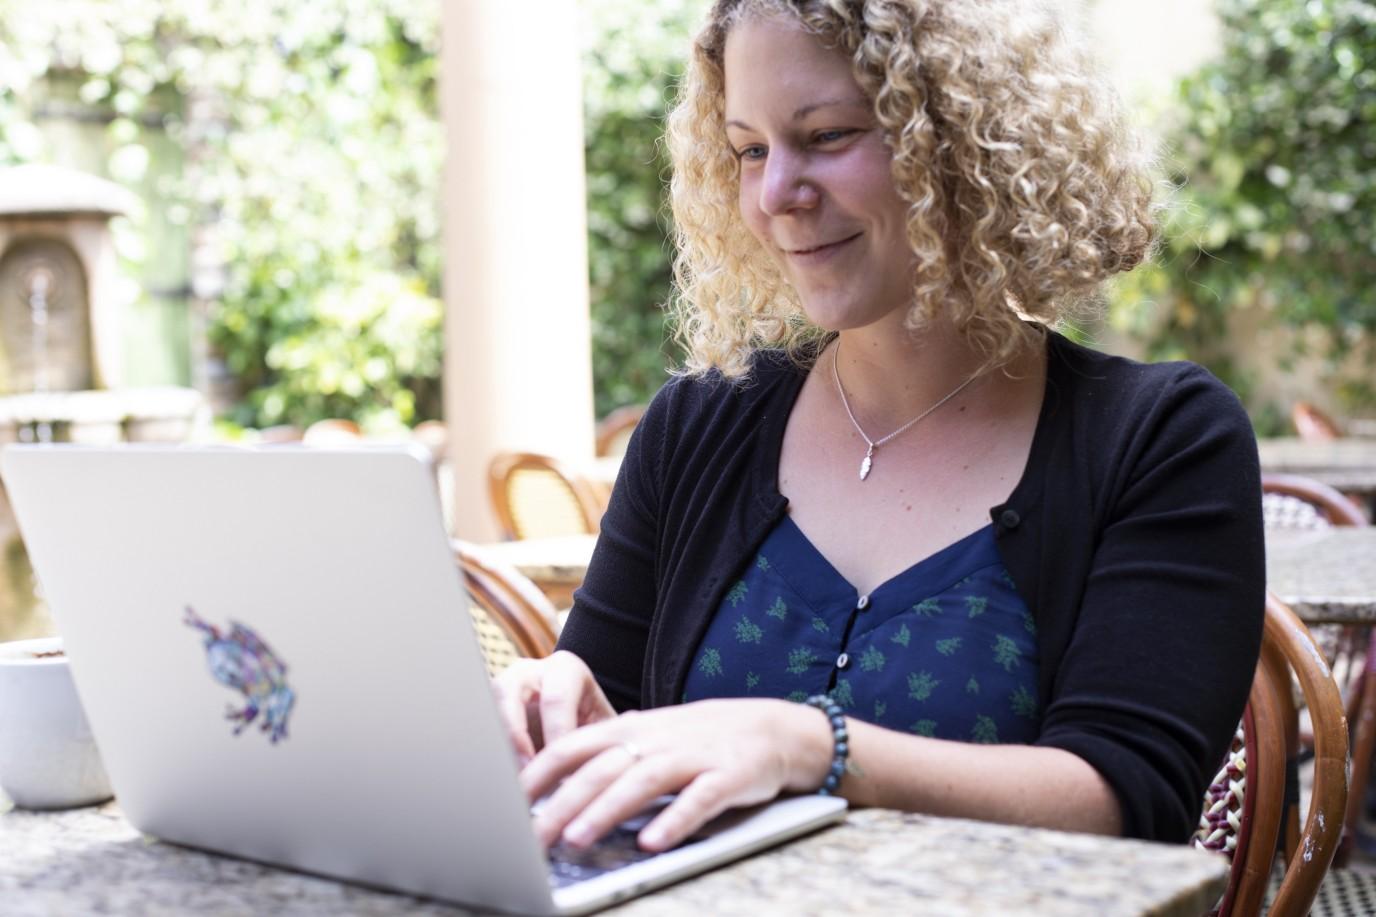 Michelle Retzlaff - Xolo Leap customer & digital nomad extraordinaire